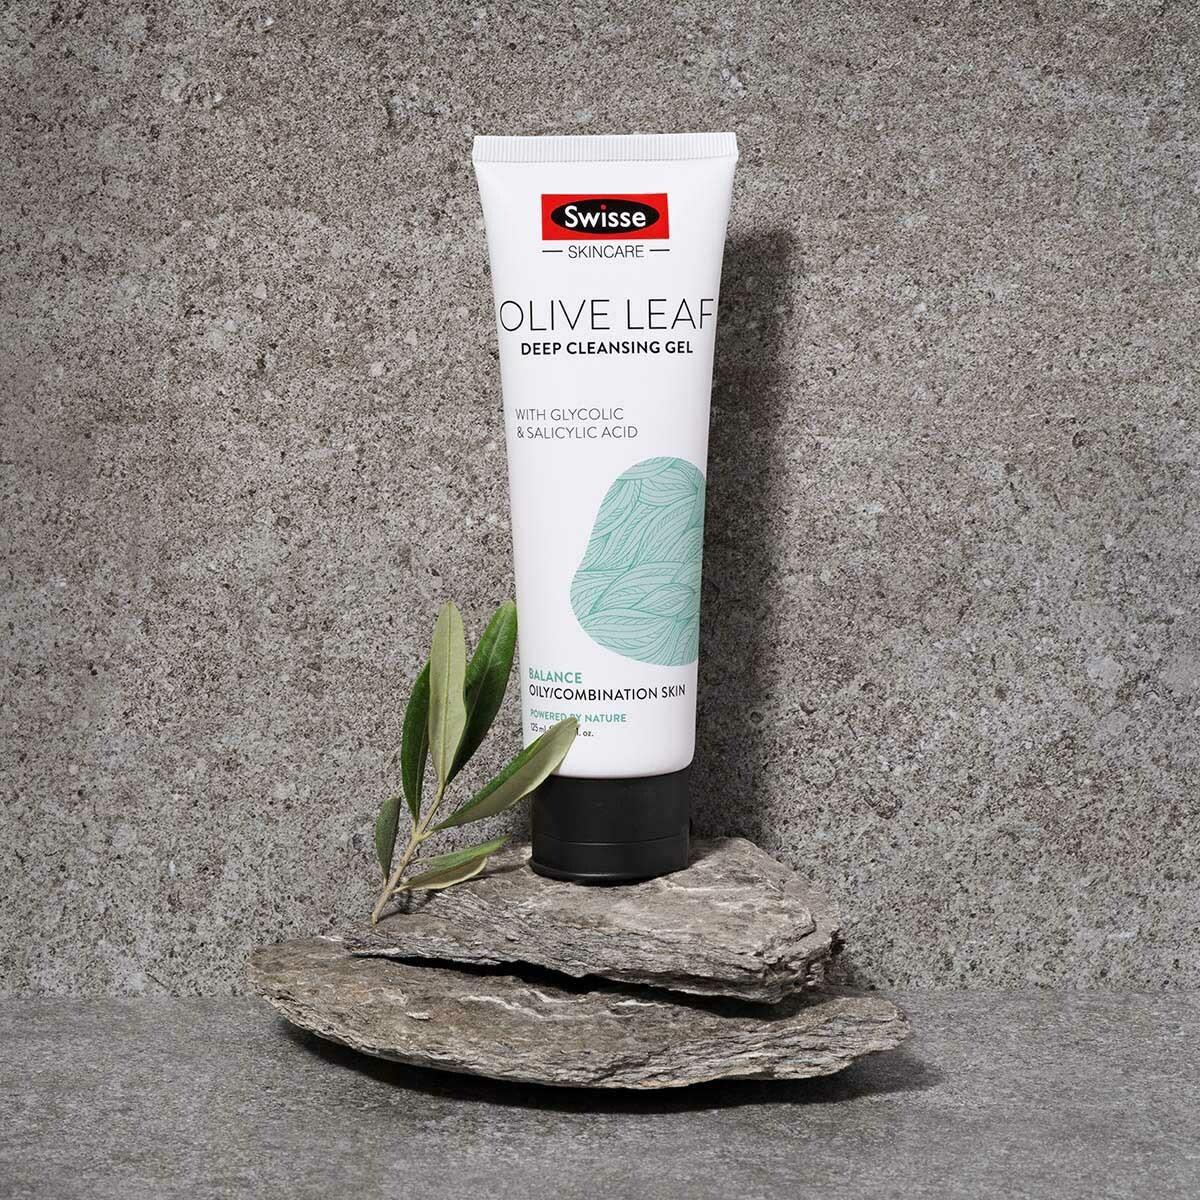 Swisse Olive Leaf Deep Cleansing Gel